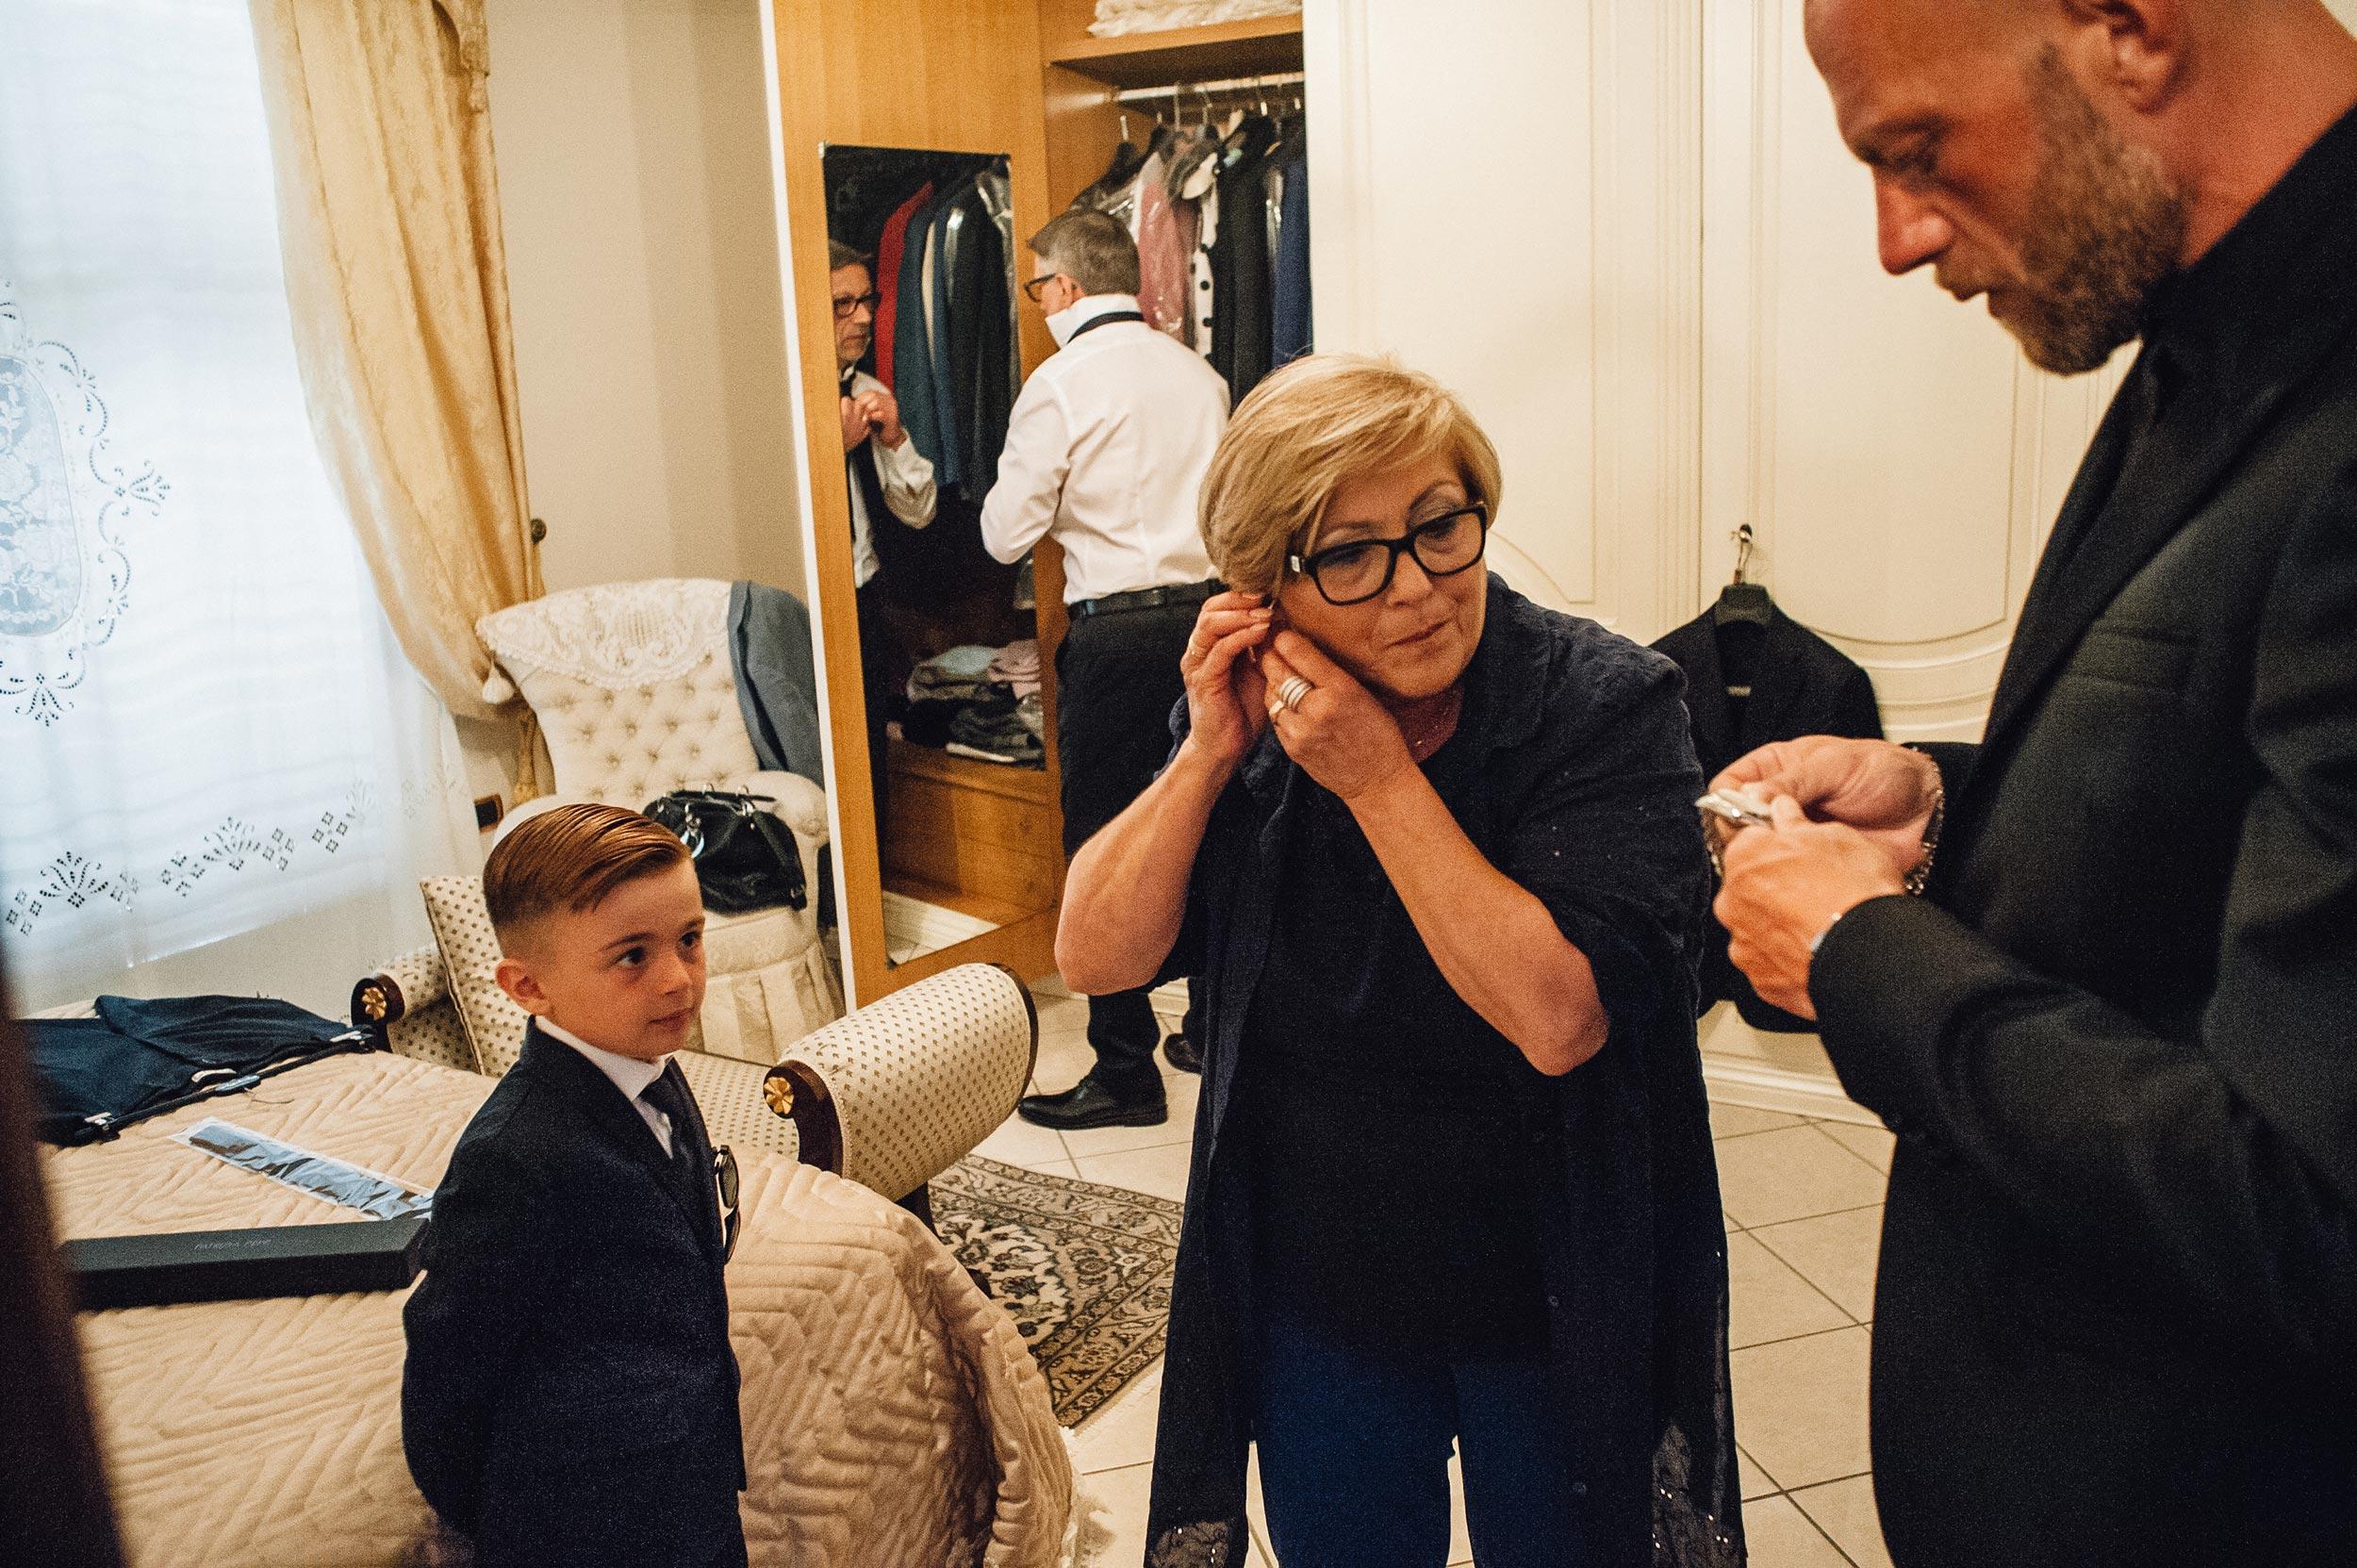 2016-Claudio-Teresa-Naples-Wedding-Photographer-Italy-Alessandro-Avenali-6.jpg